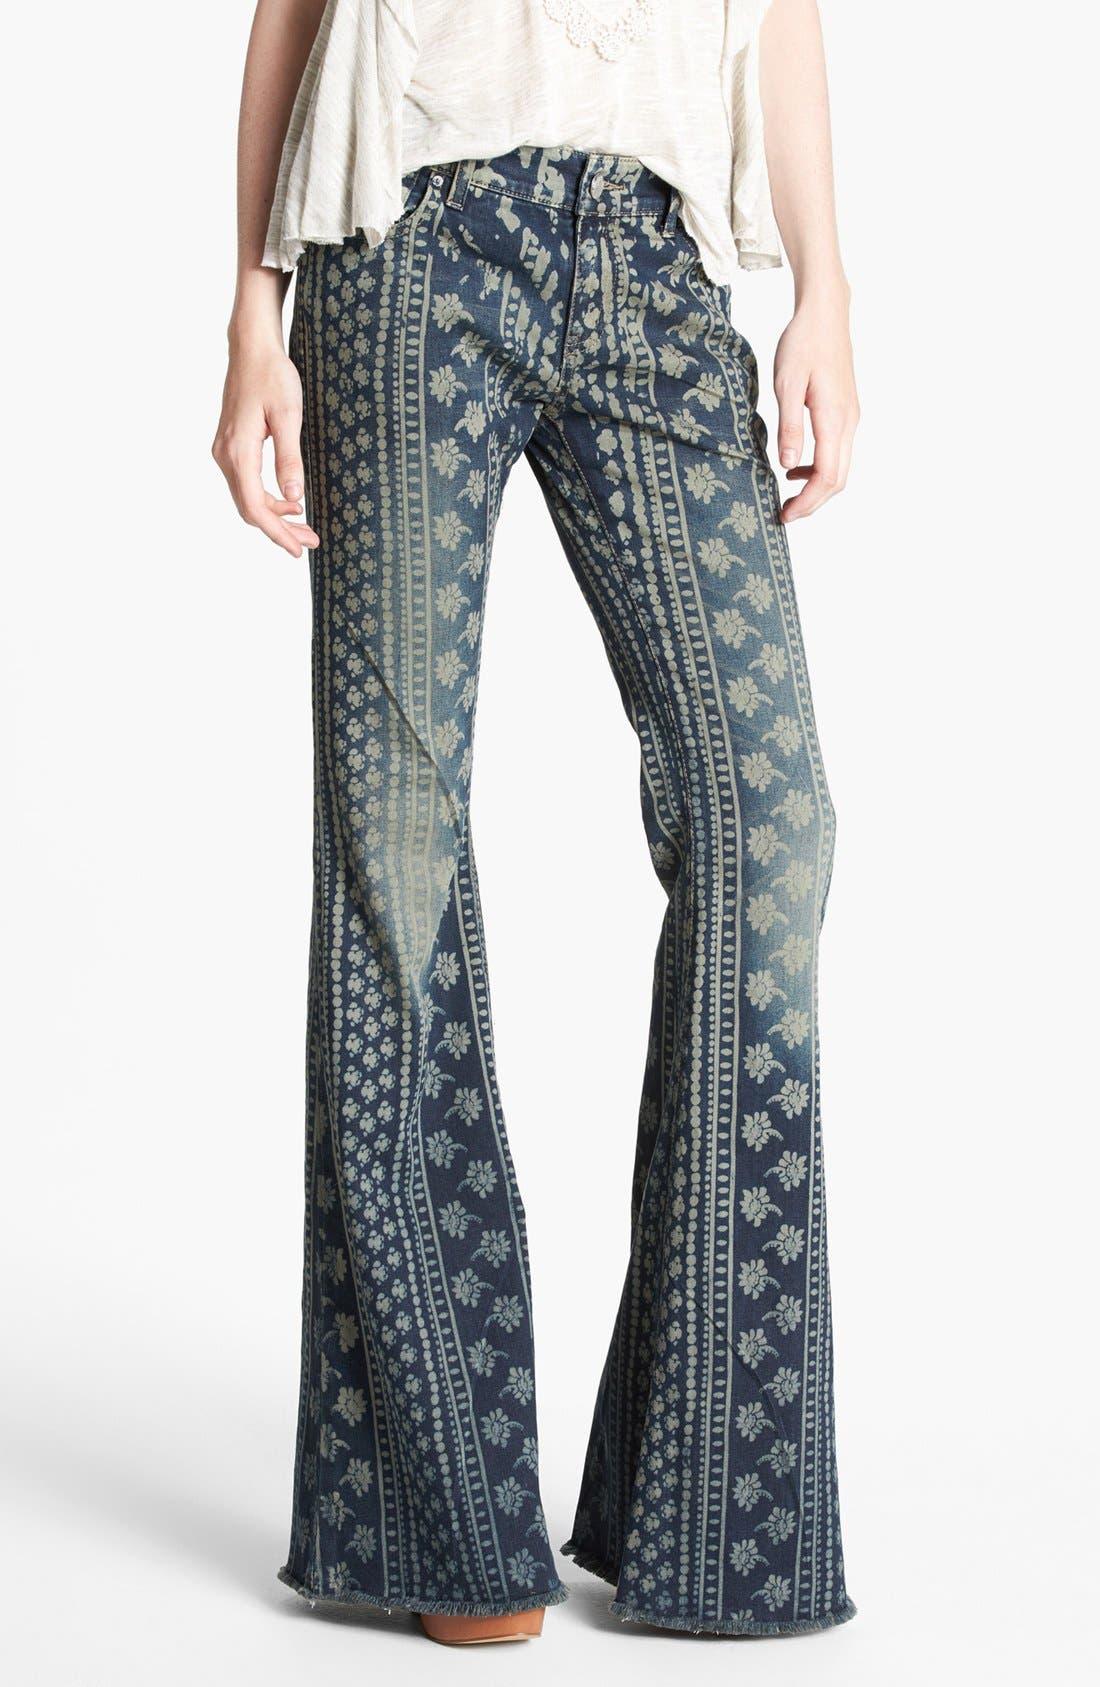 Alternate Image 1 Selected - Free People 'Bali' Print Flare Leg Jeans (Indigo Combo)